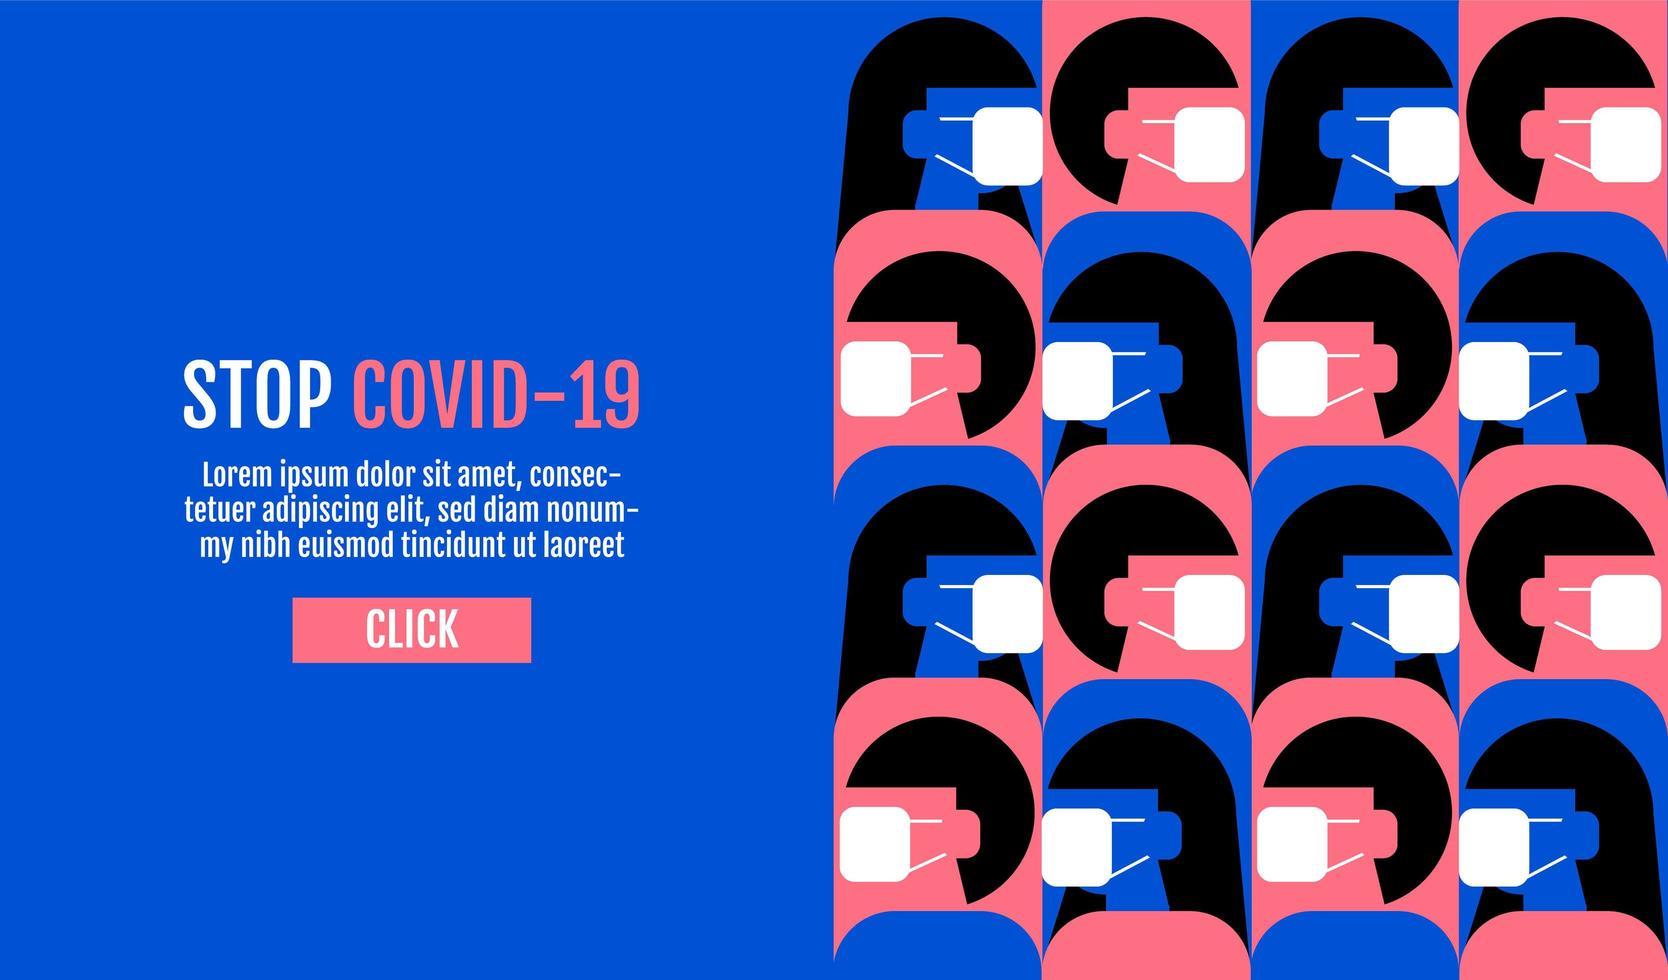 design plano stop covid-19 vetor